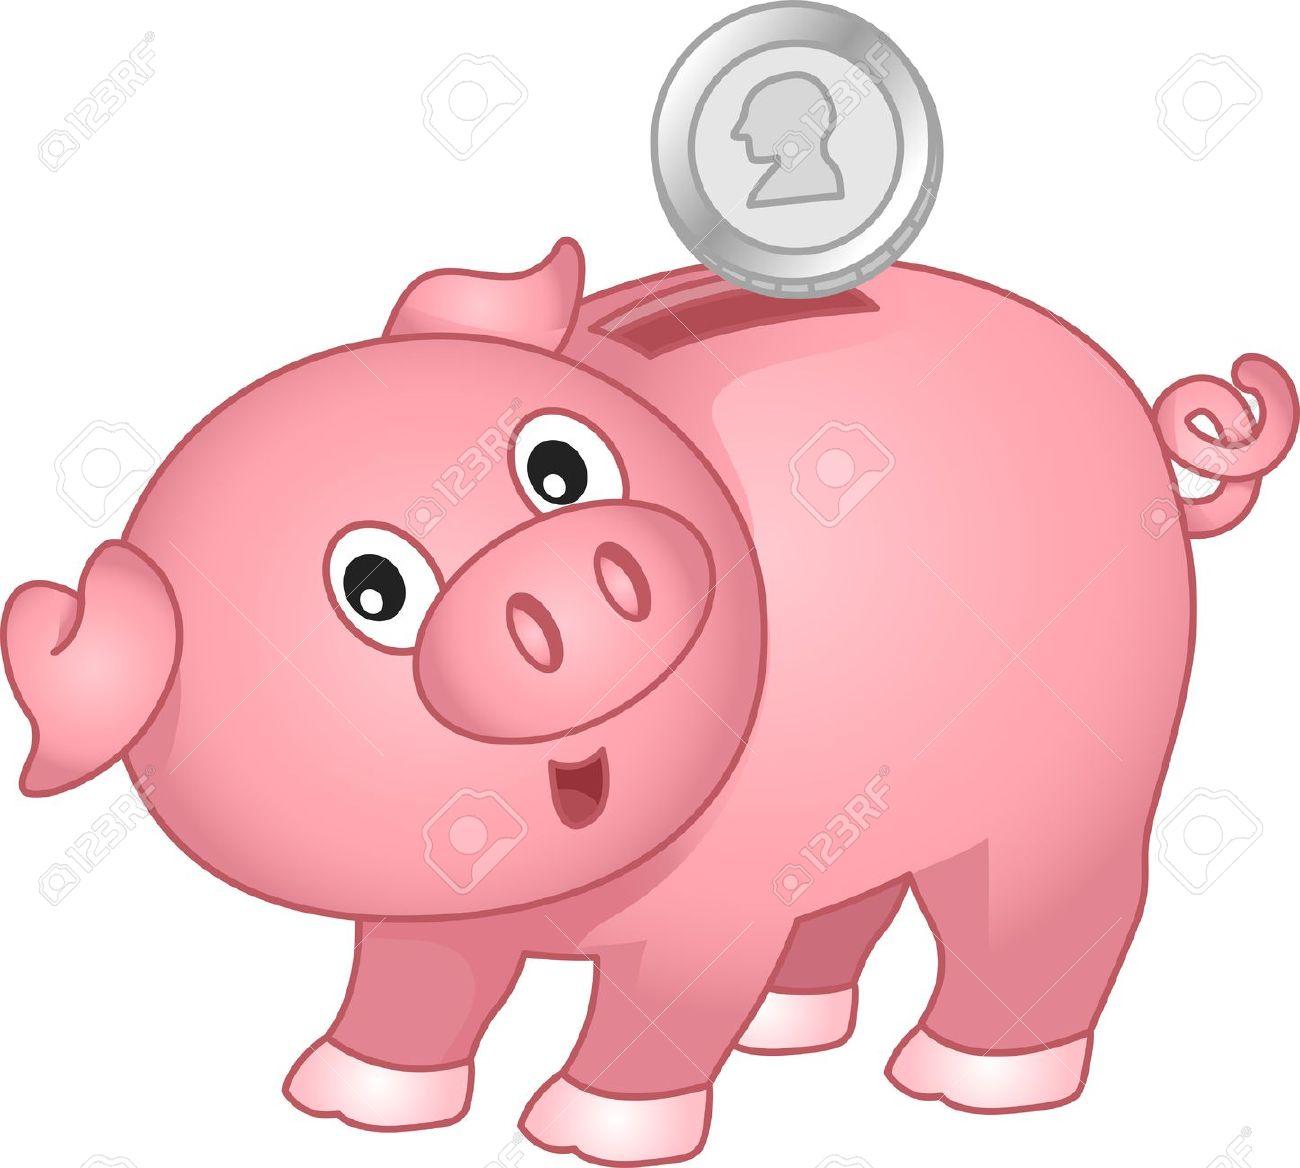 Clip Art Bank: Illustration Of .-clip art bank: Illustration of .-4